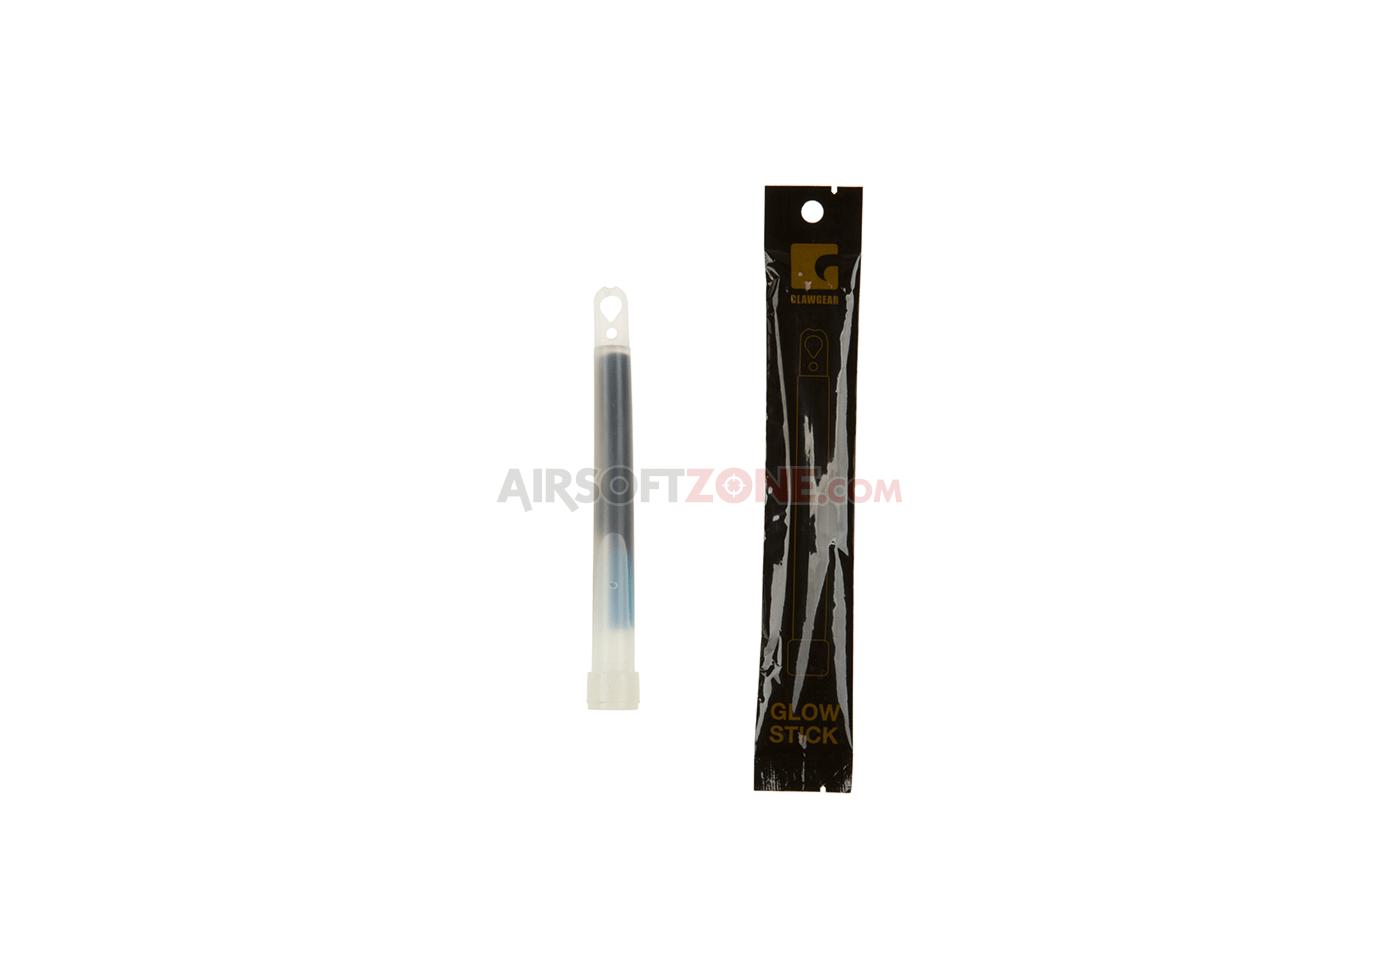 6 Inch Light Stick Infrared Clawgear